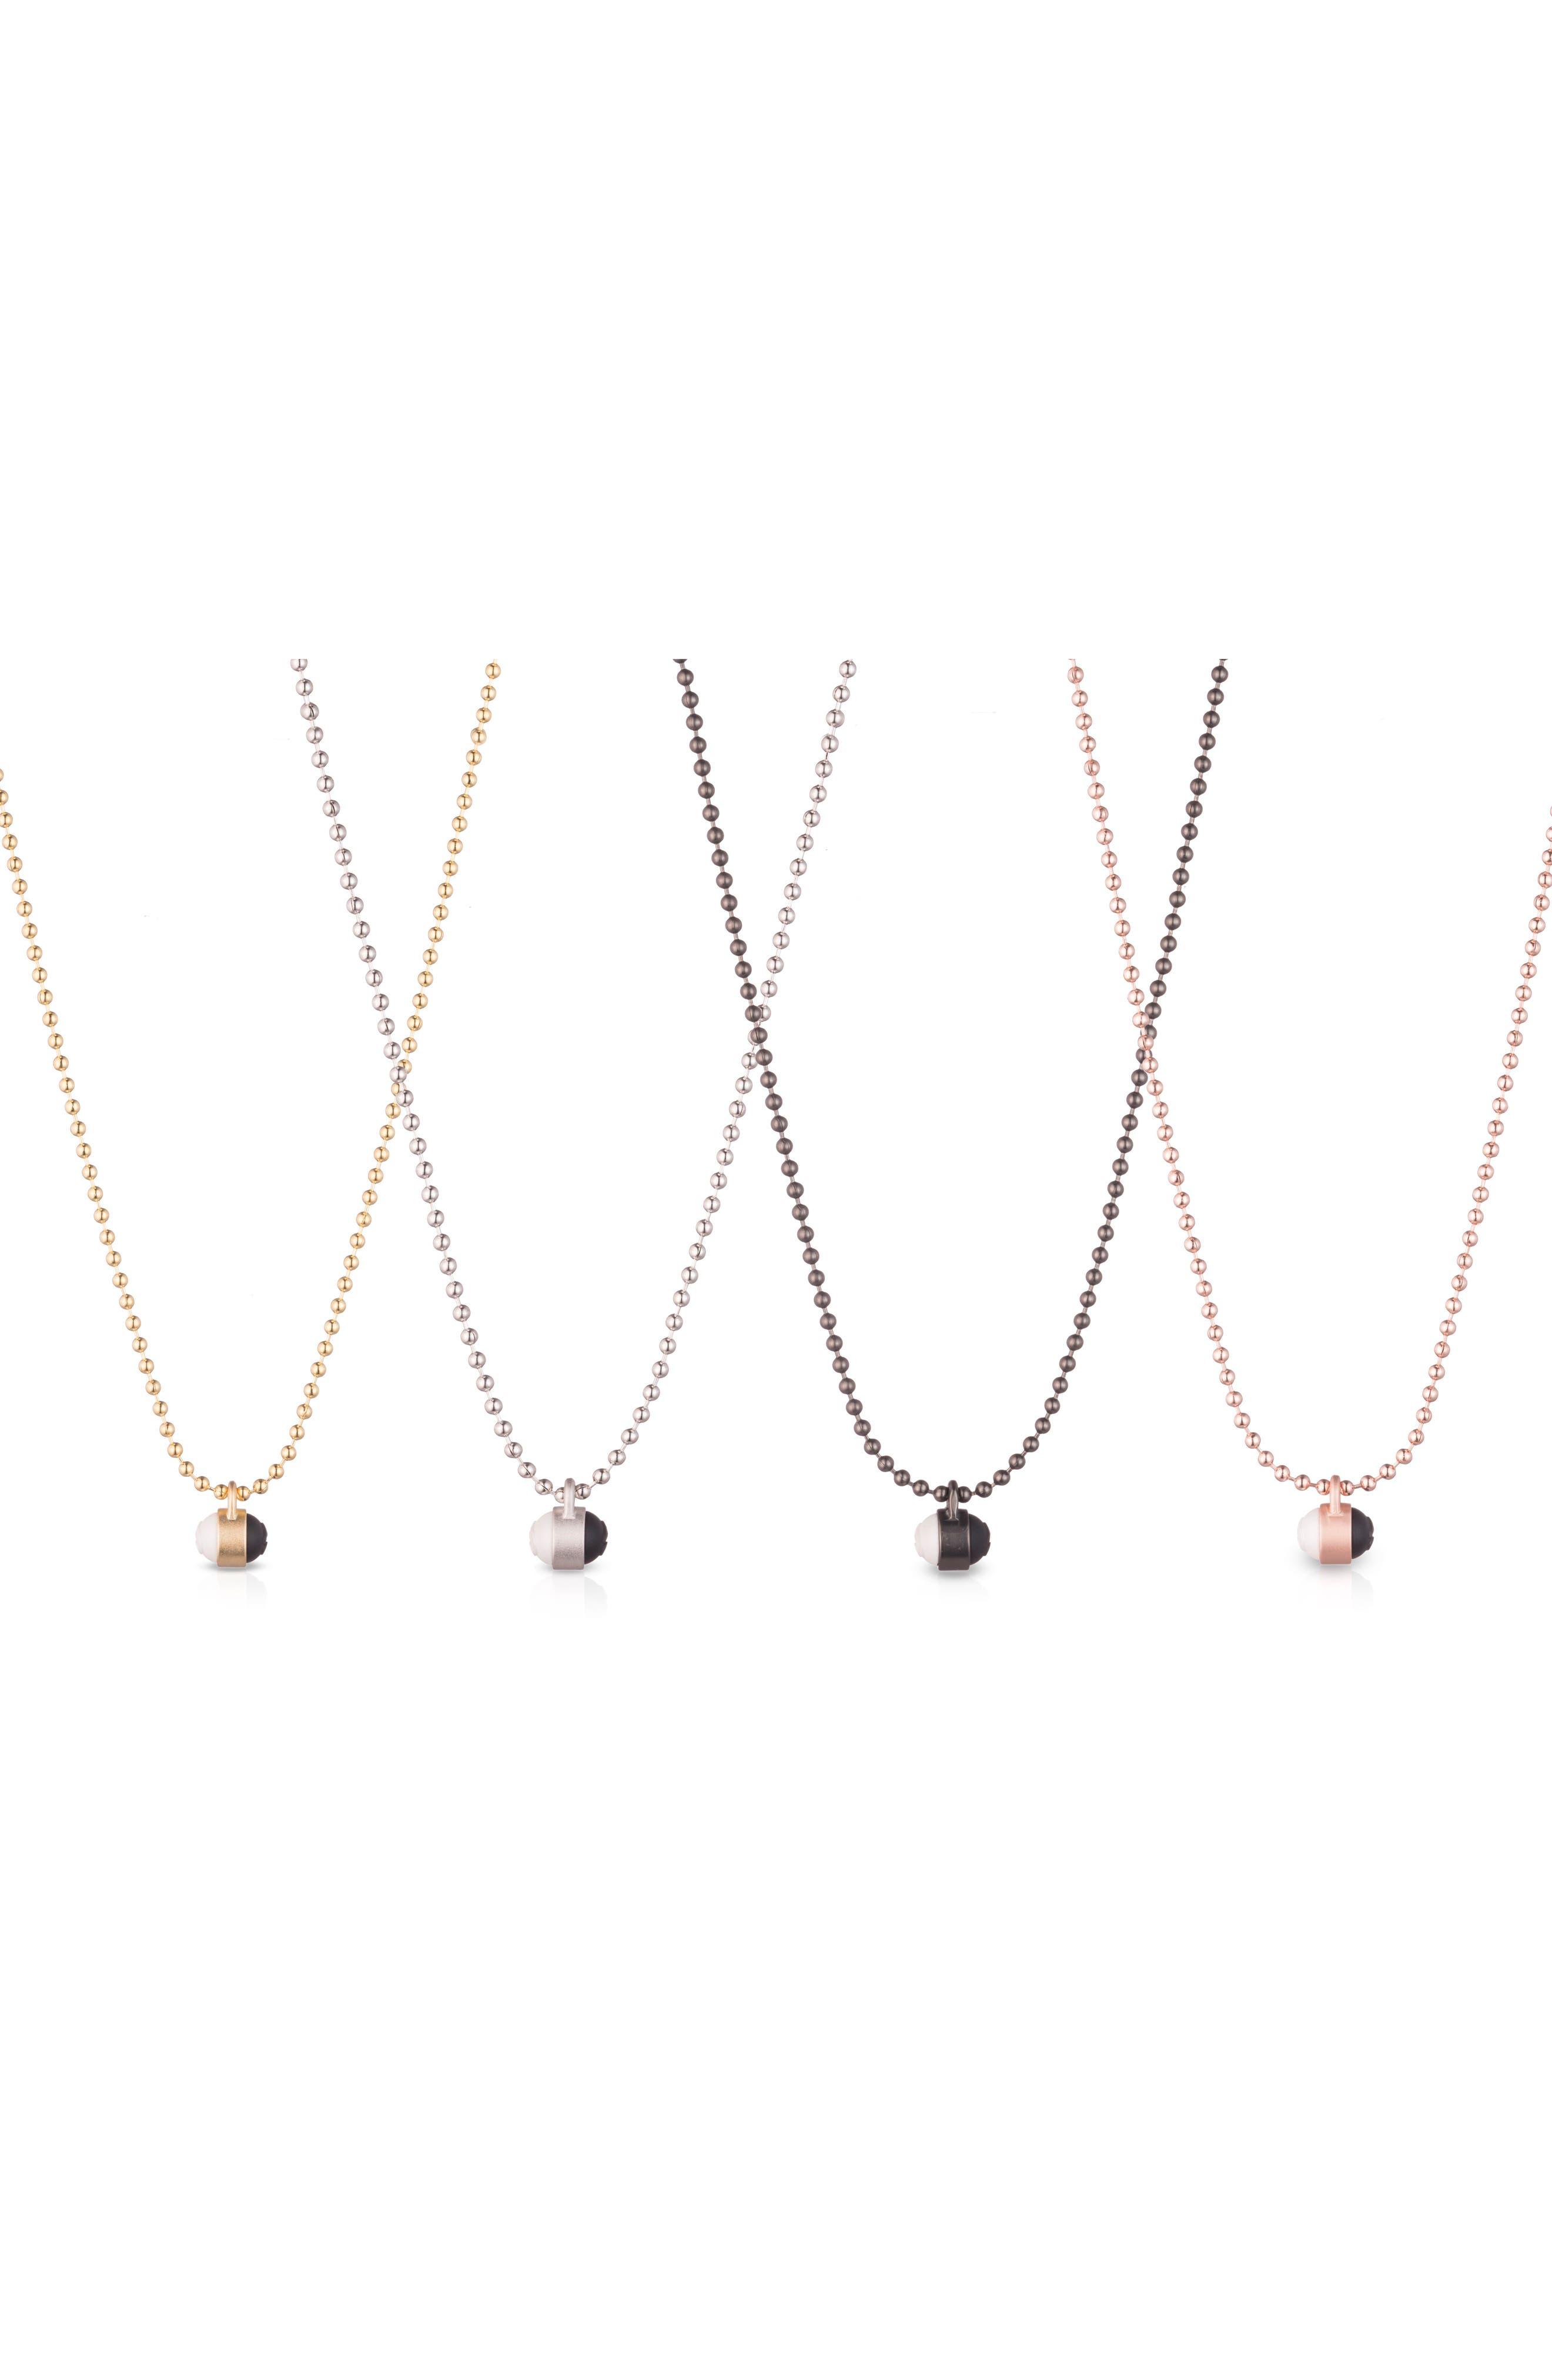 Pendant Ball Chain Necklace,                             Alternate thumbnail 16, color,